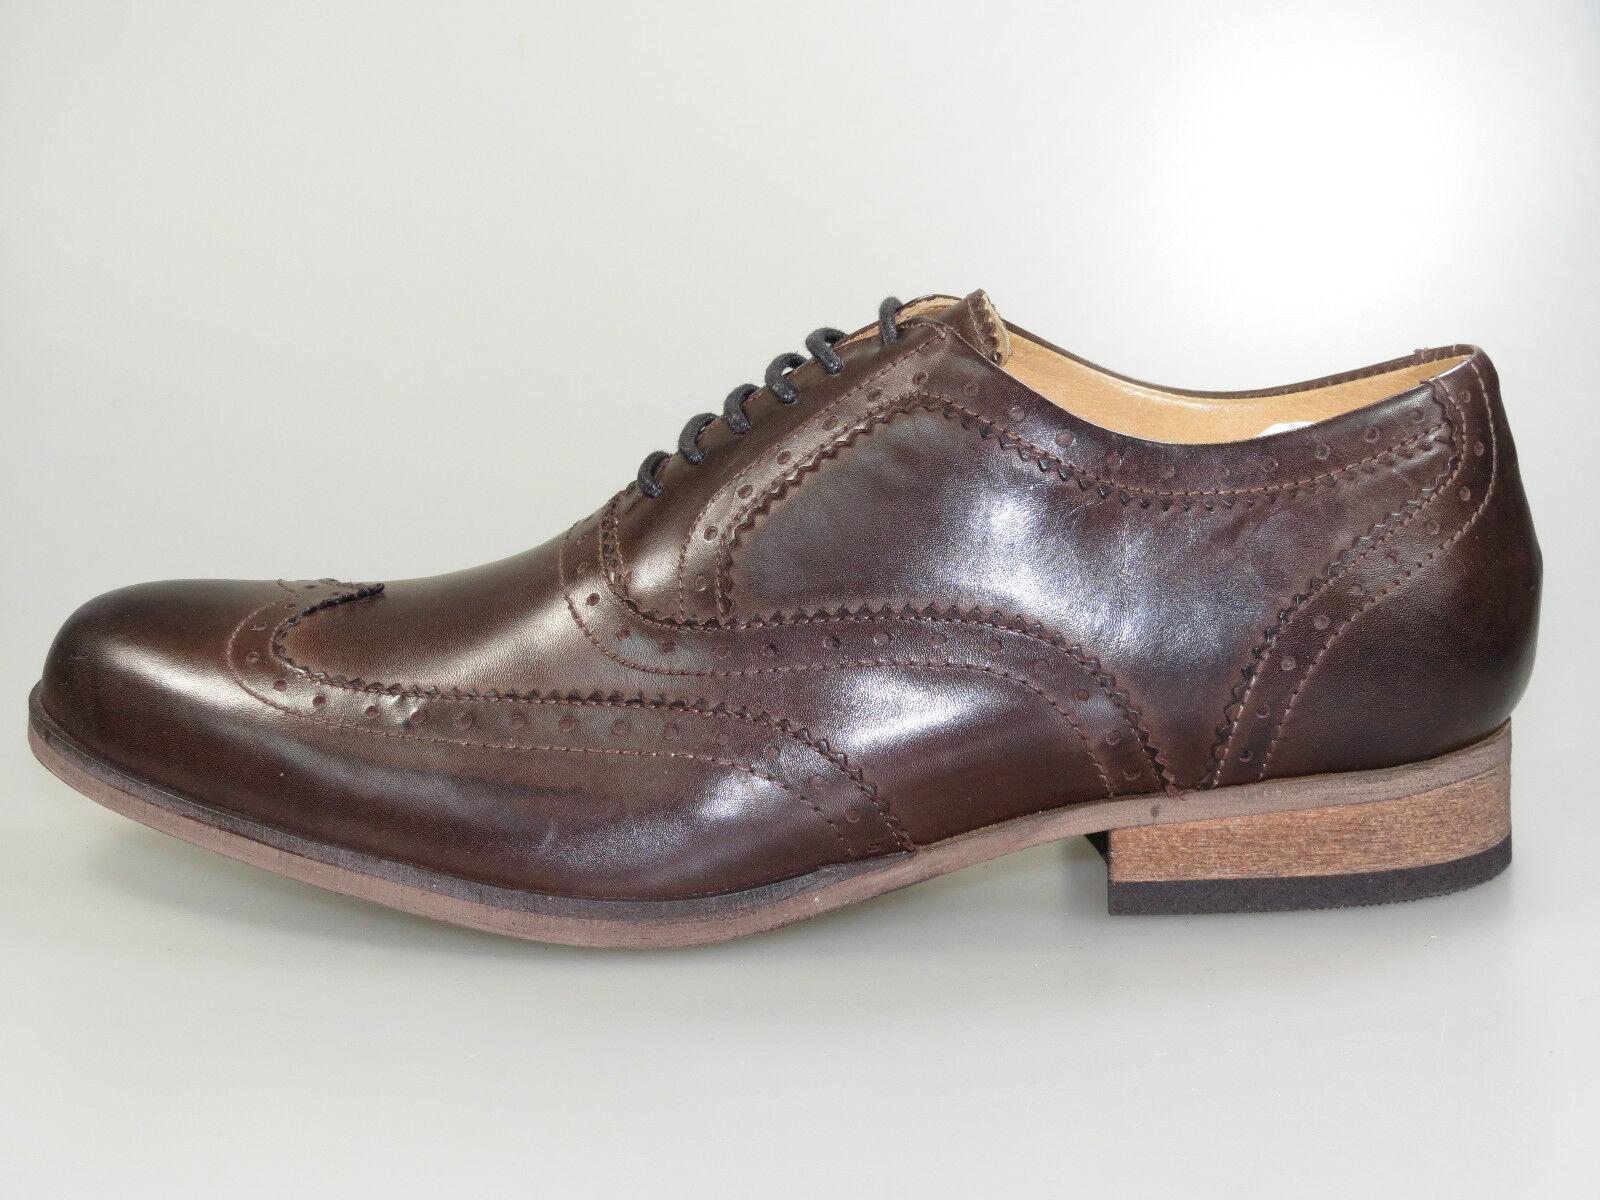 Maruti Schuhe Vestone Men 66.20168.2054 Braun Leder Leather +NEU+